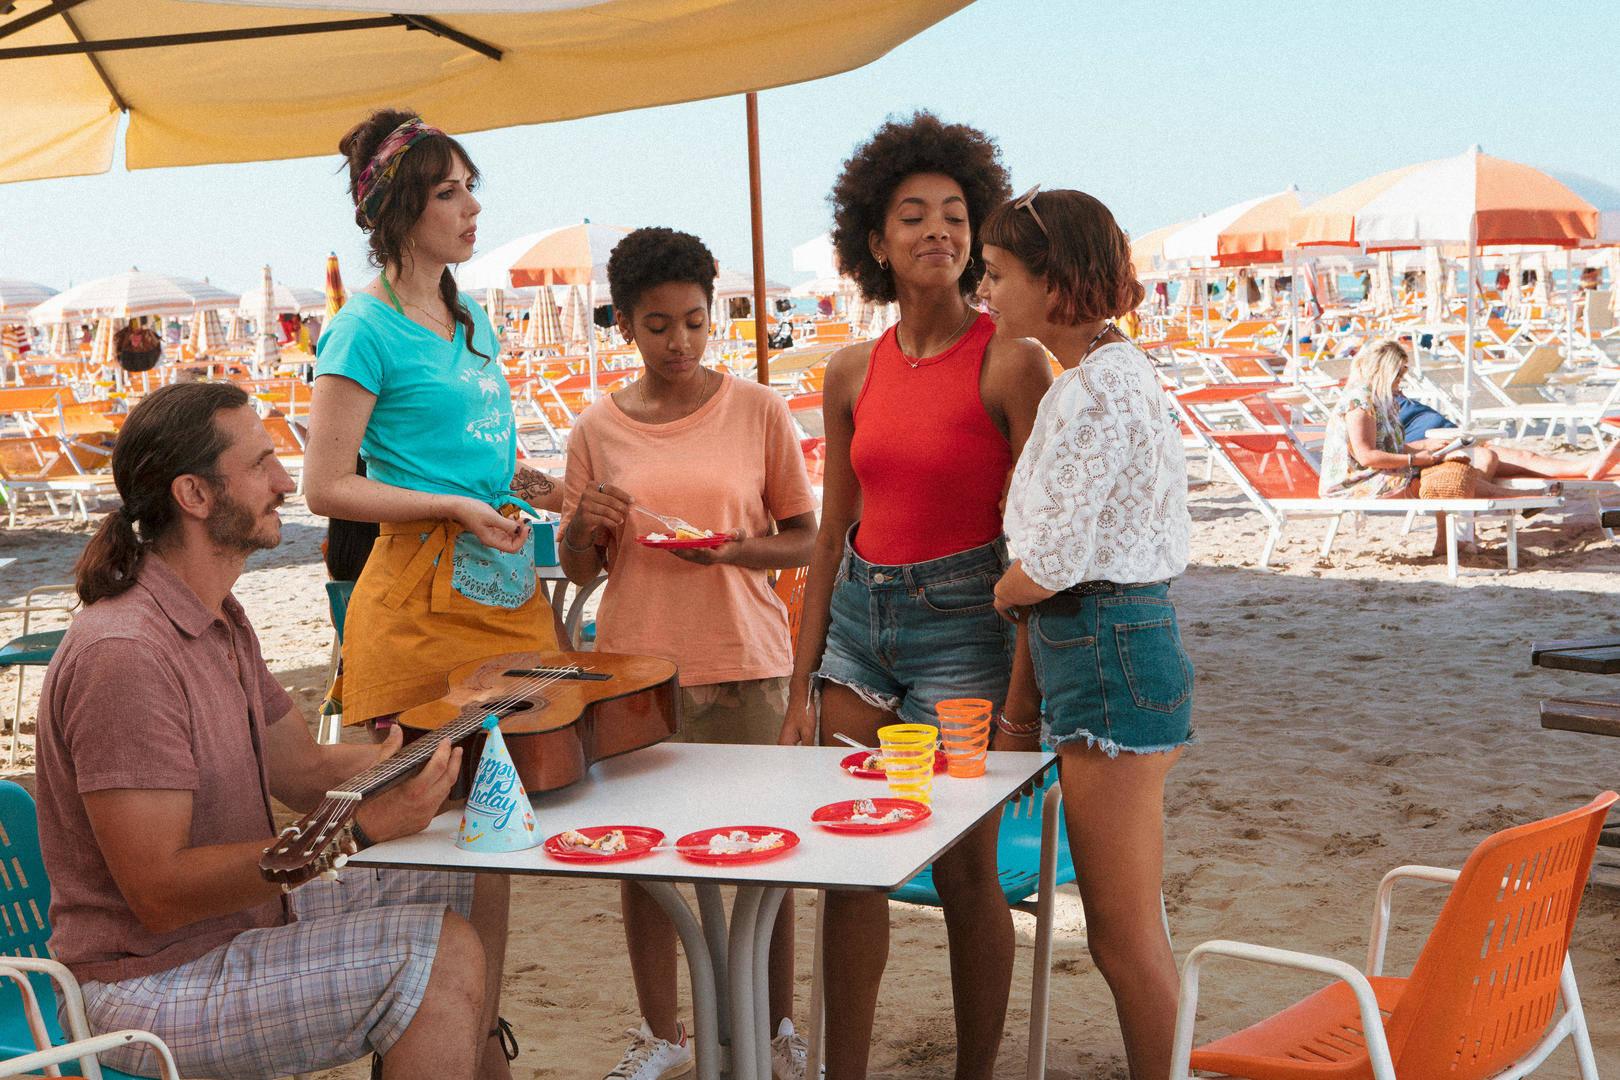 Summertime recensione serie TV Netflix